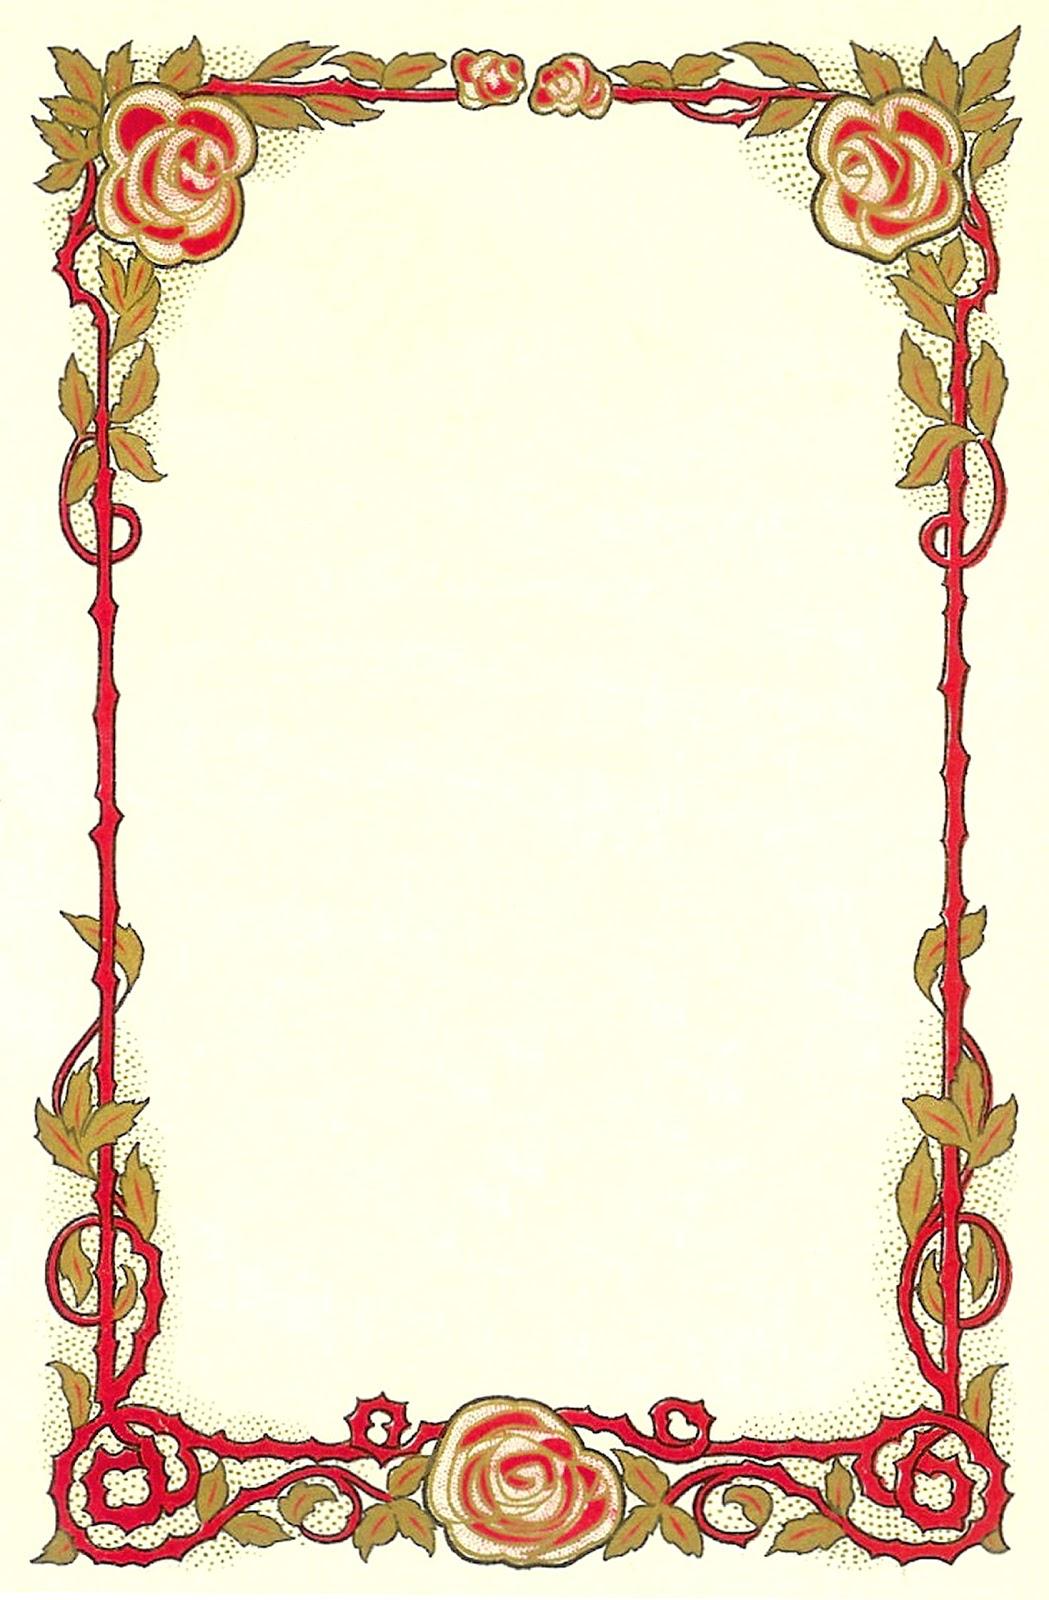 Interior Designs clipart vintage Flower Frame Graphic Clip of